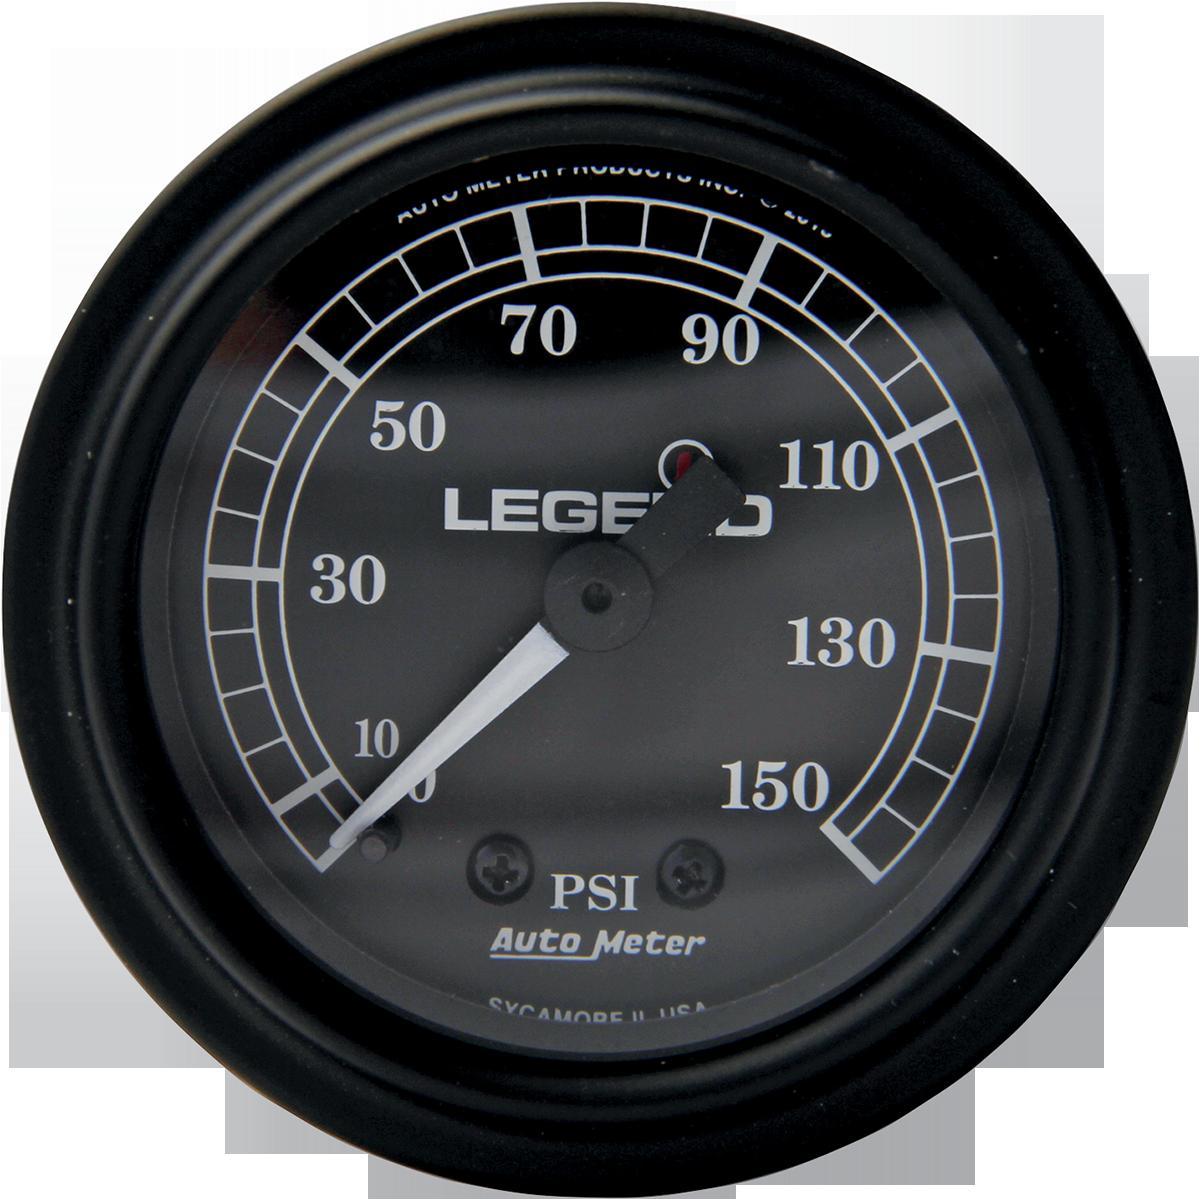 Legends black front fairing psi air pressure gauge harley